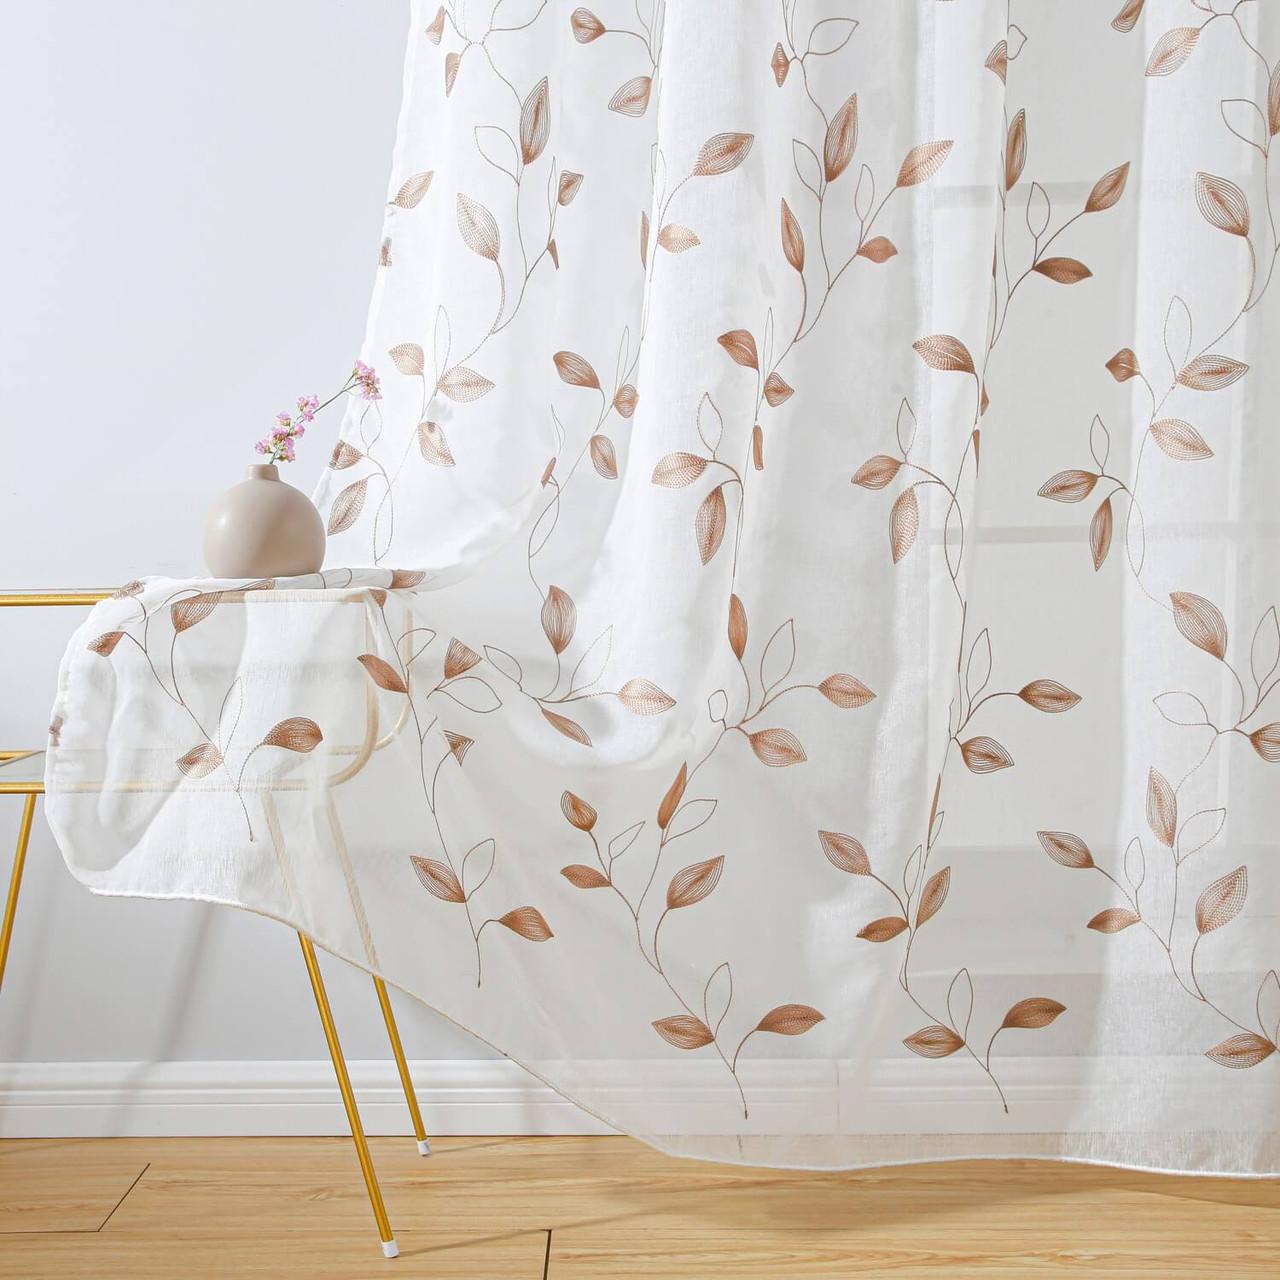 Floral Embroidery Window Treatments DMC729 Dolce Mela 8171460152140